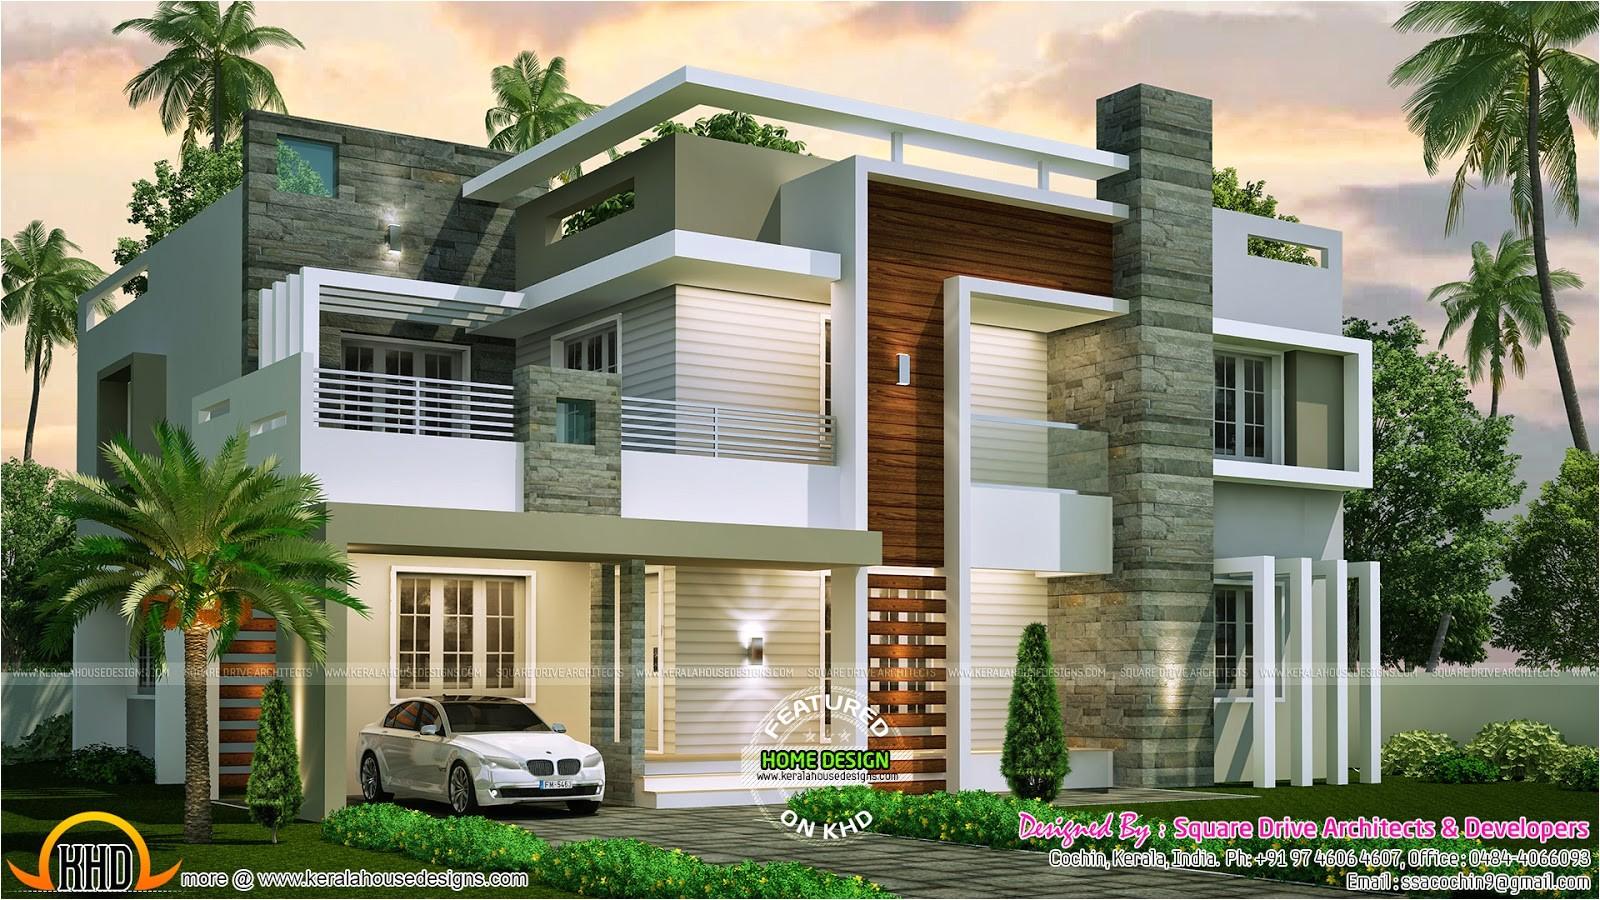 4 bedroom contemporary home design